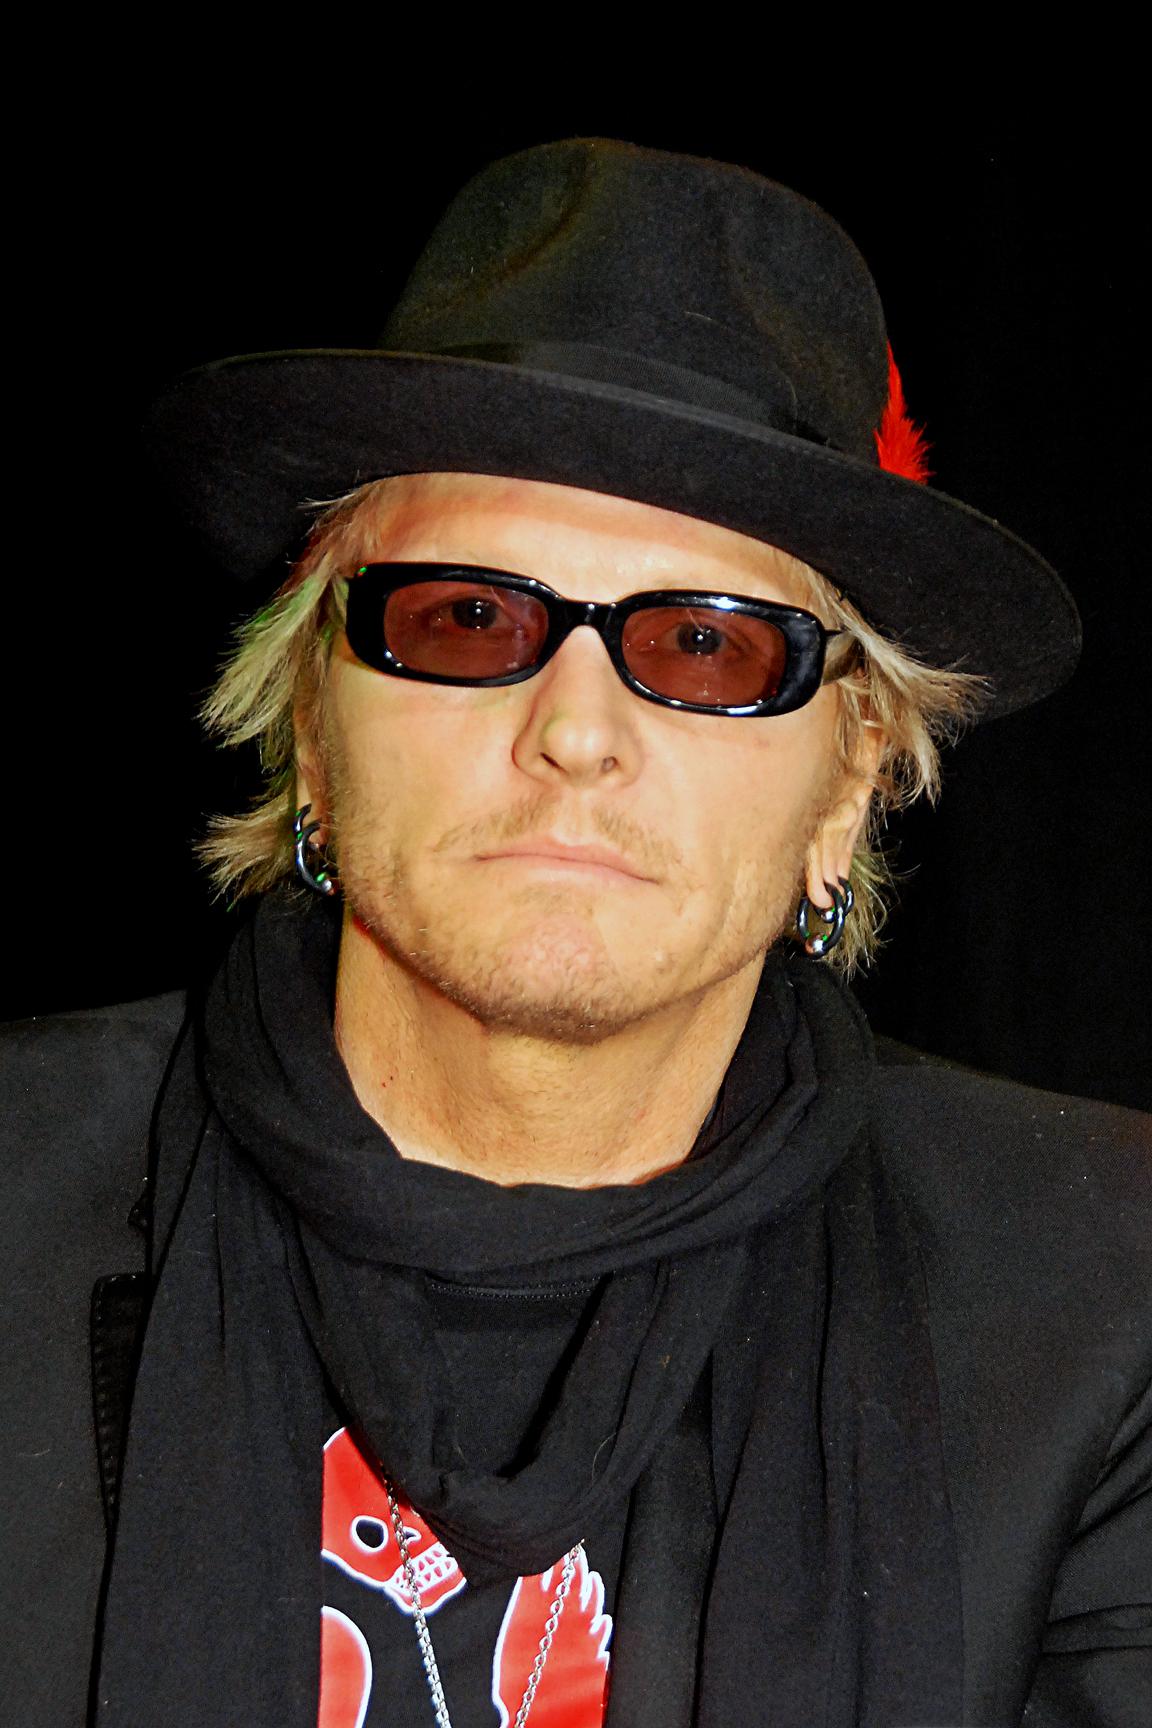 Guns N' Roses Drummer Matt Sorum to Develop CBD Product Line for GSRX Industries Subsidiary